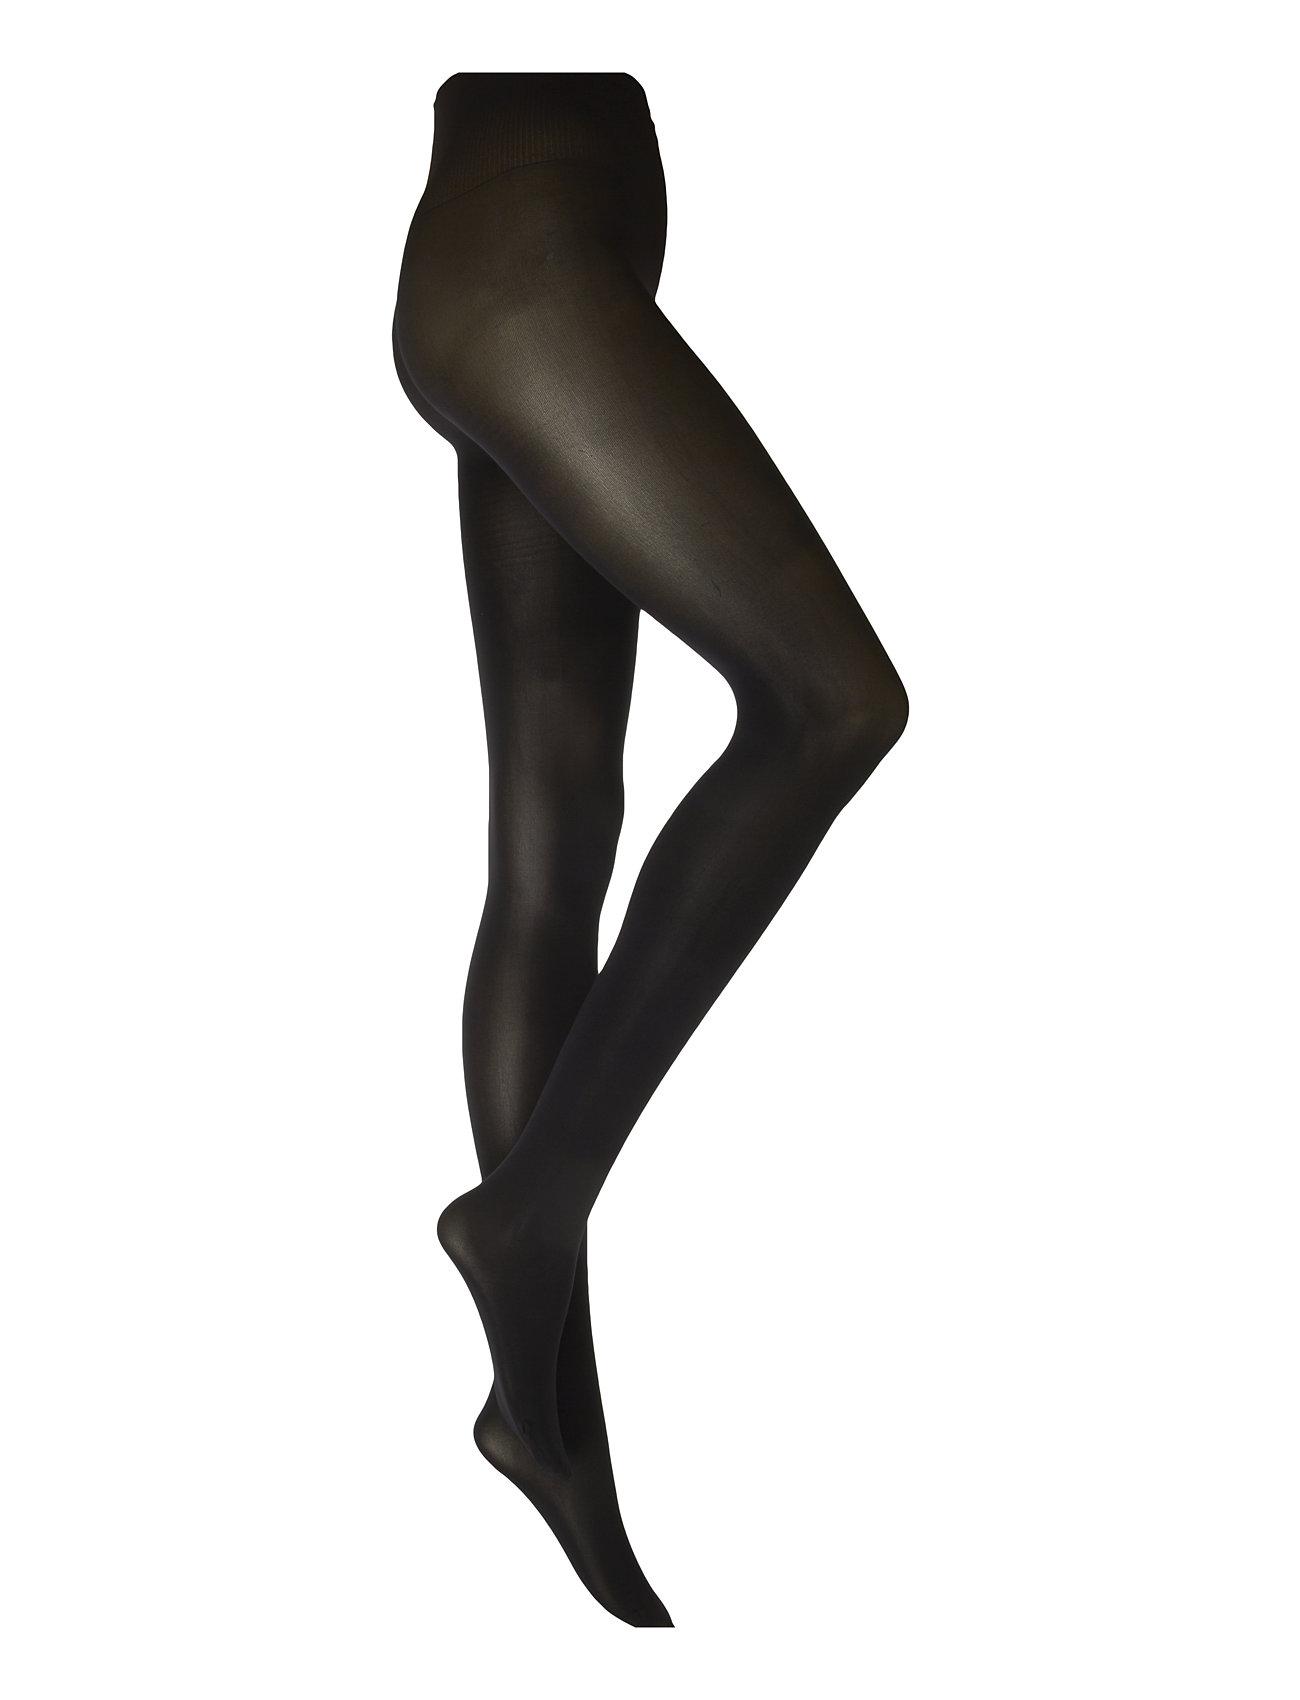 Swedish Stockings Olivia Premium tights 60D - BLACK